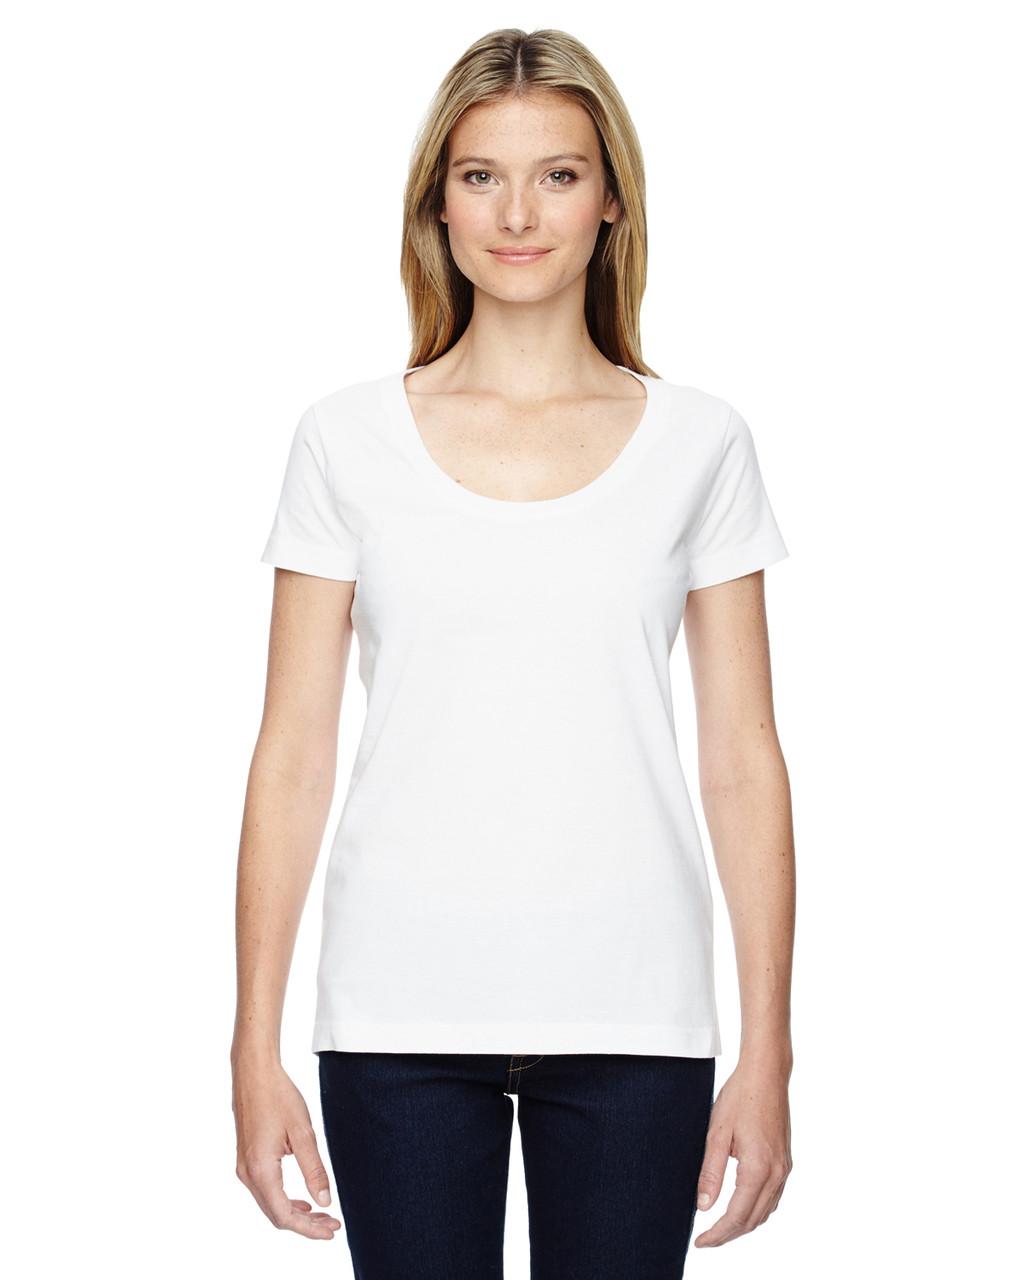 0d6fa8081cfe LAT 3504 Ladies'' Scoop Neck T-Shirt - ClothingAuthority.com